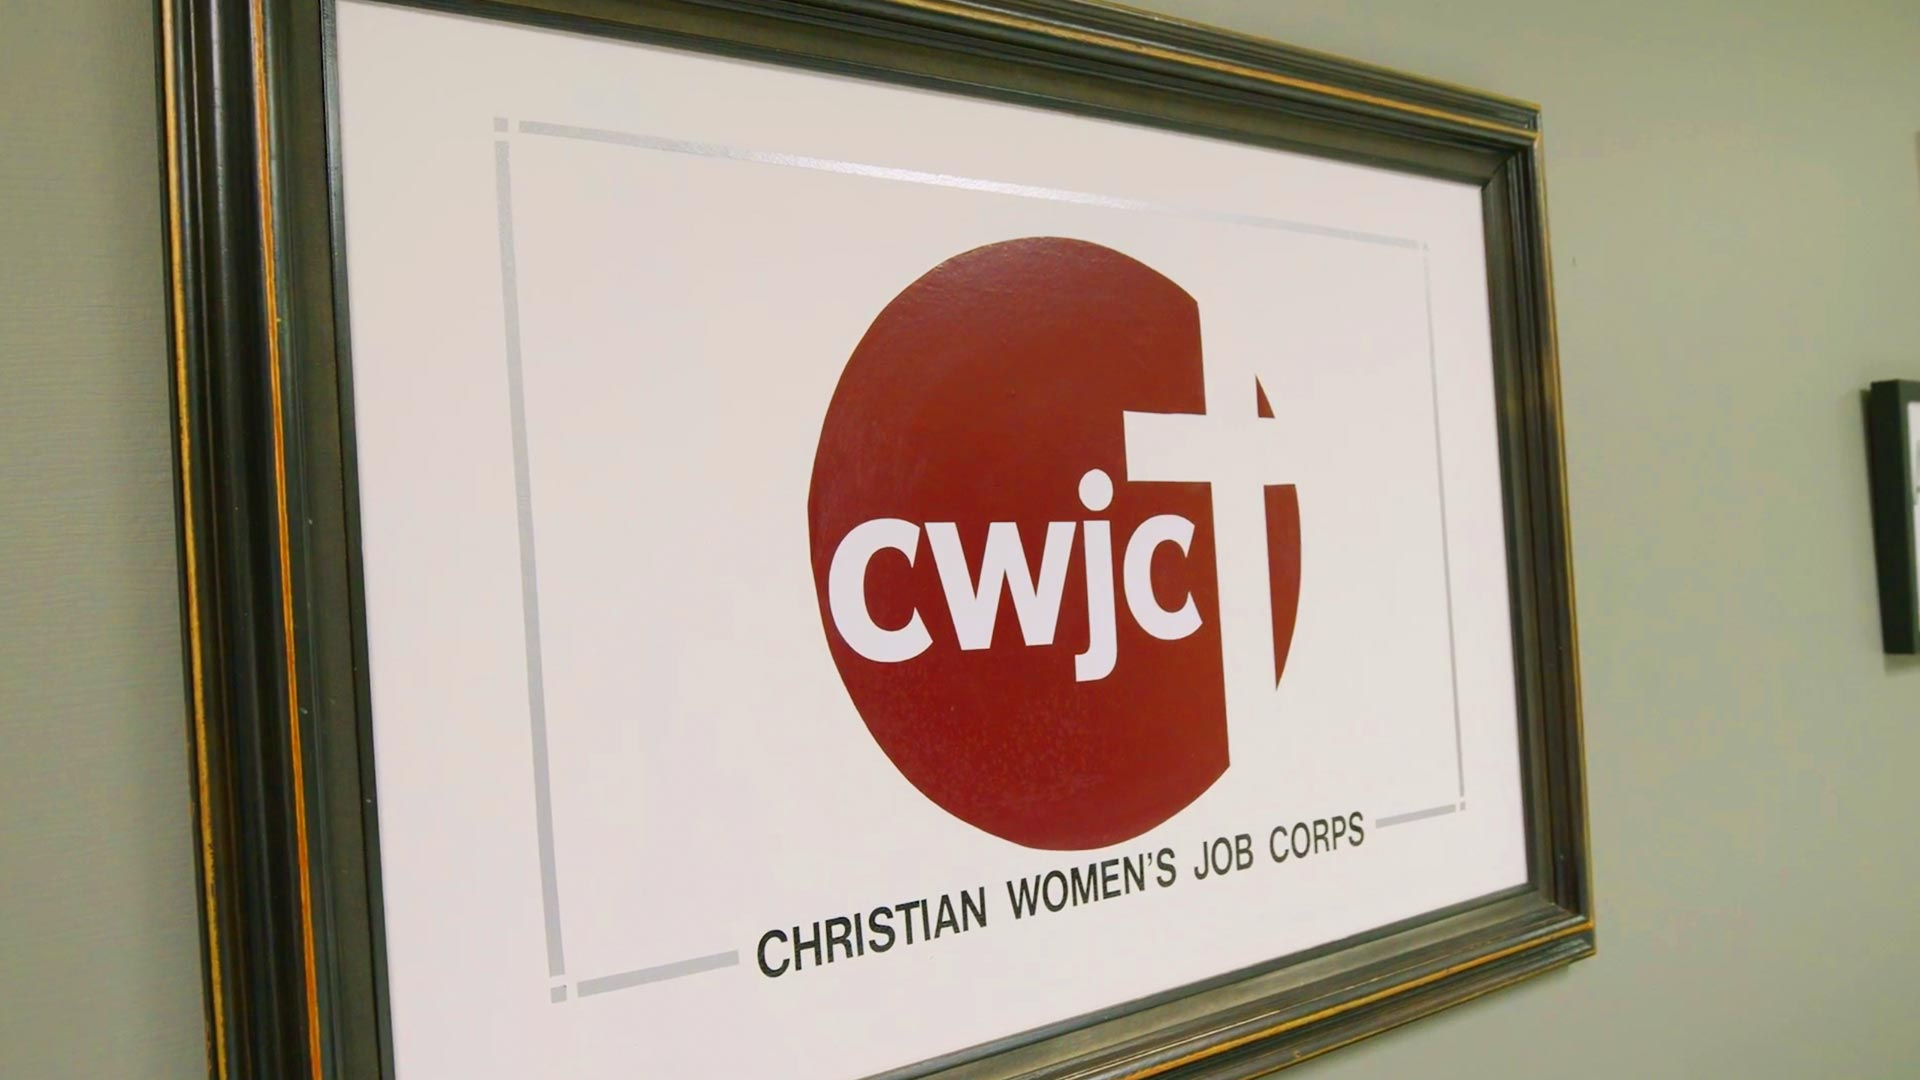 Video – Christian Women's Job Corps Promo